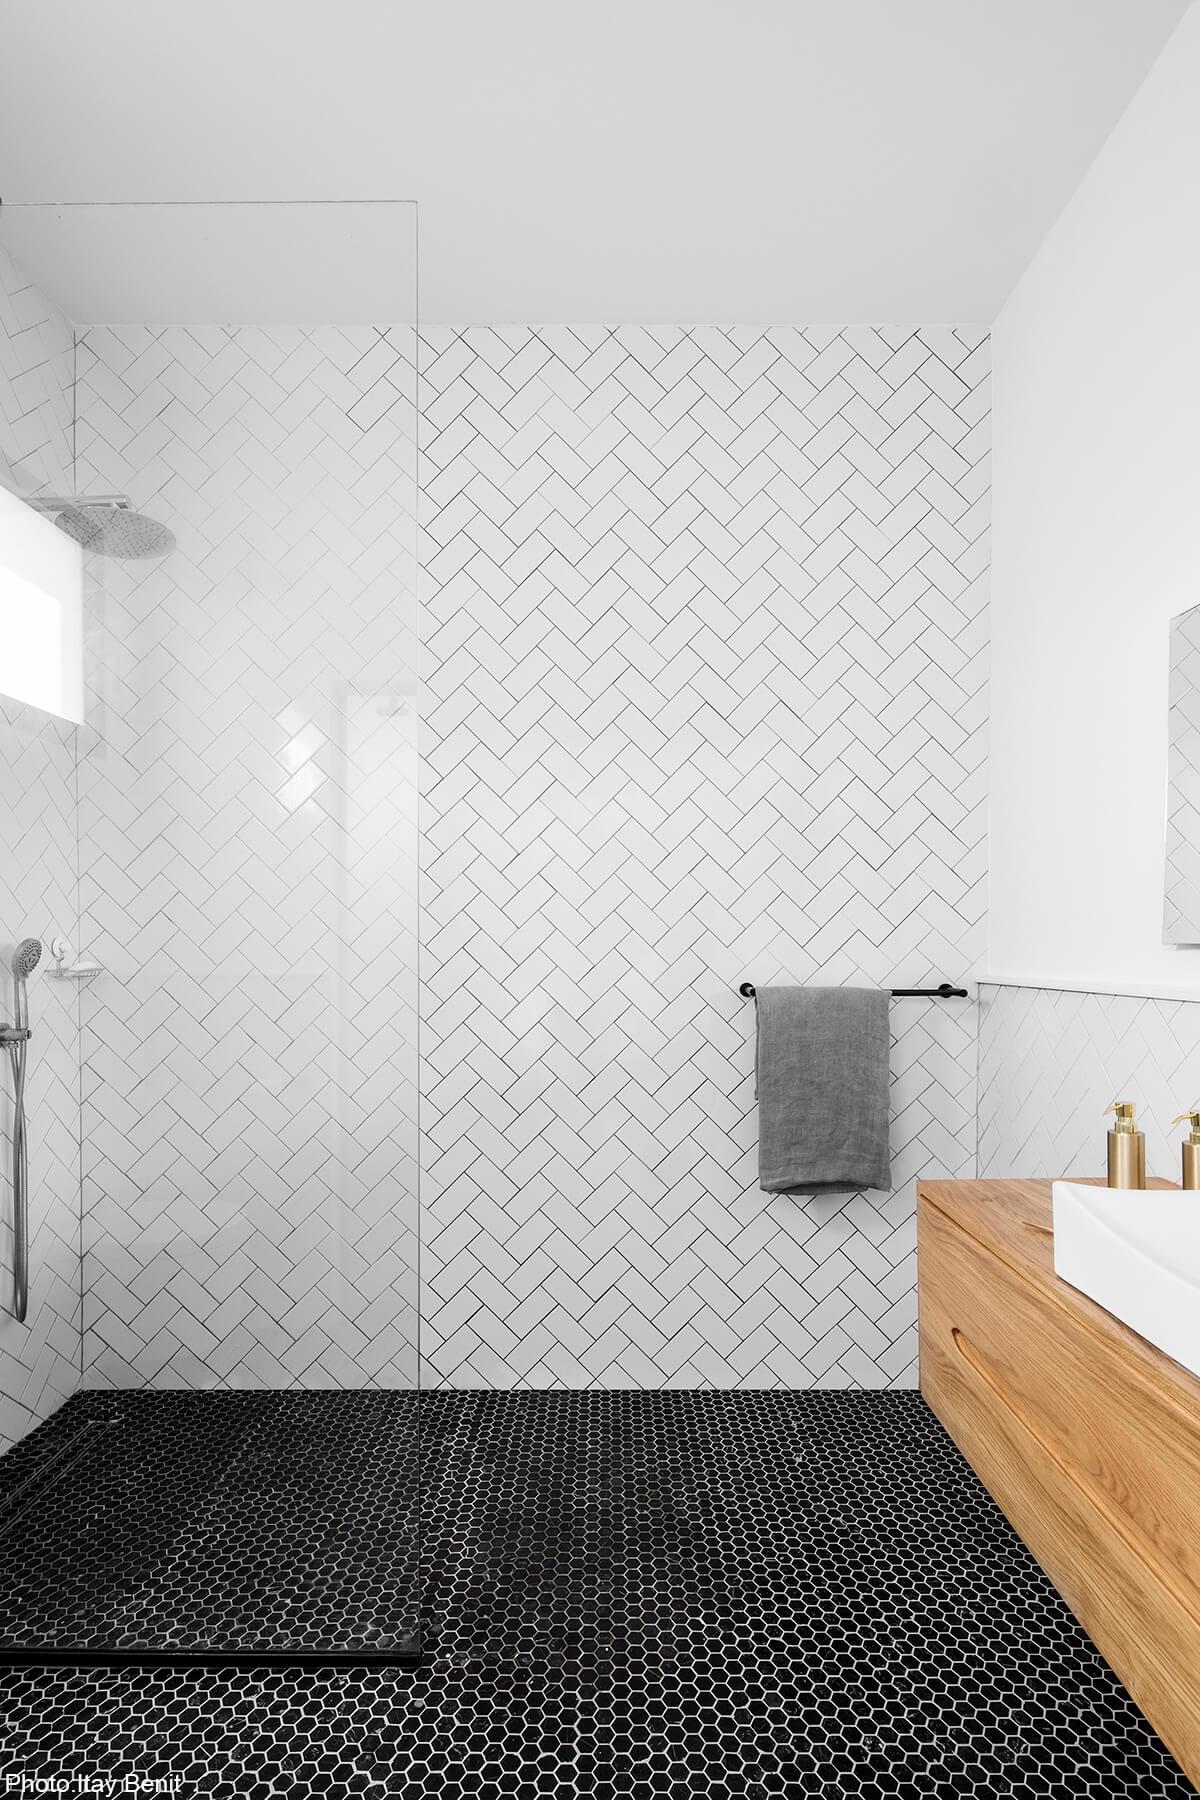 White bathroom tiles in 180sqm House designed by Carmit Gat - Fineshmaker